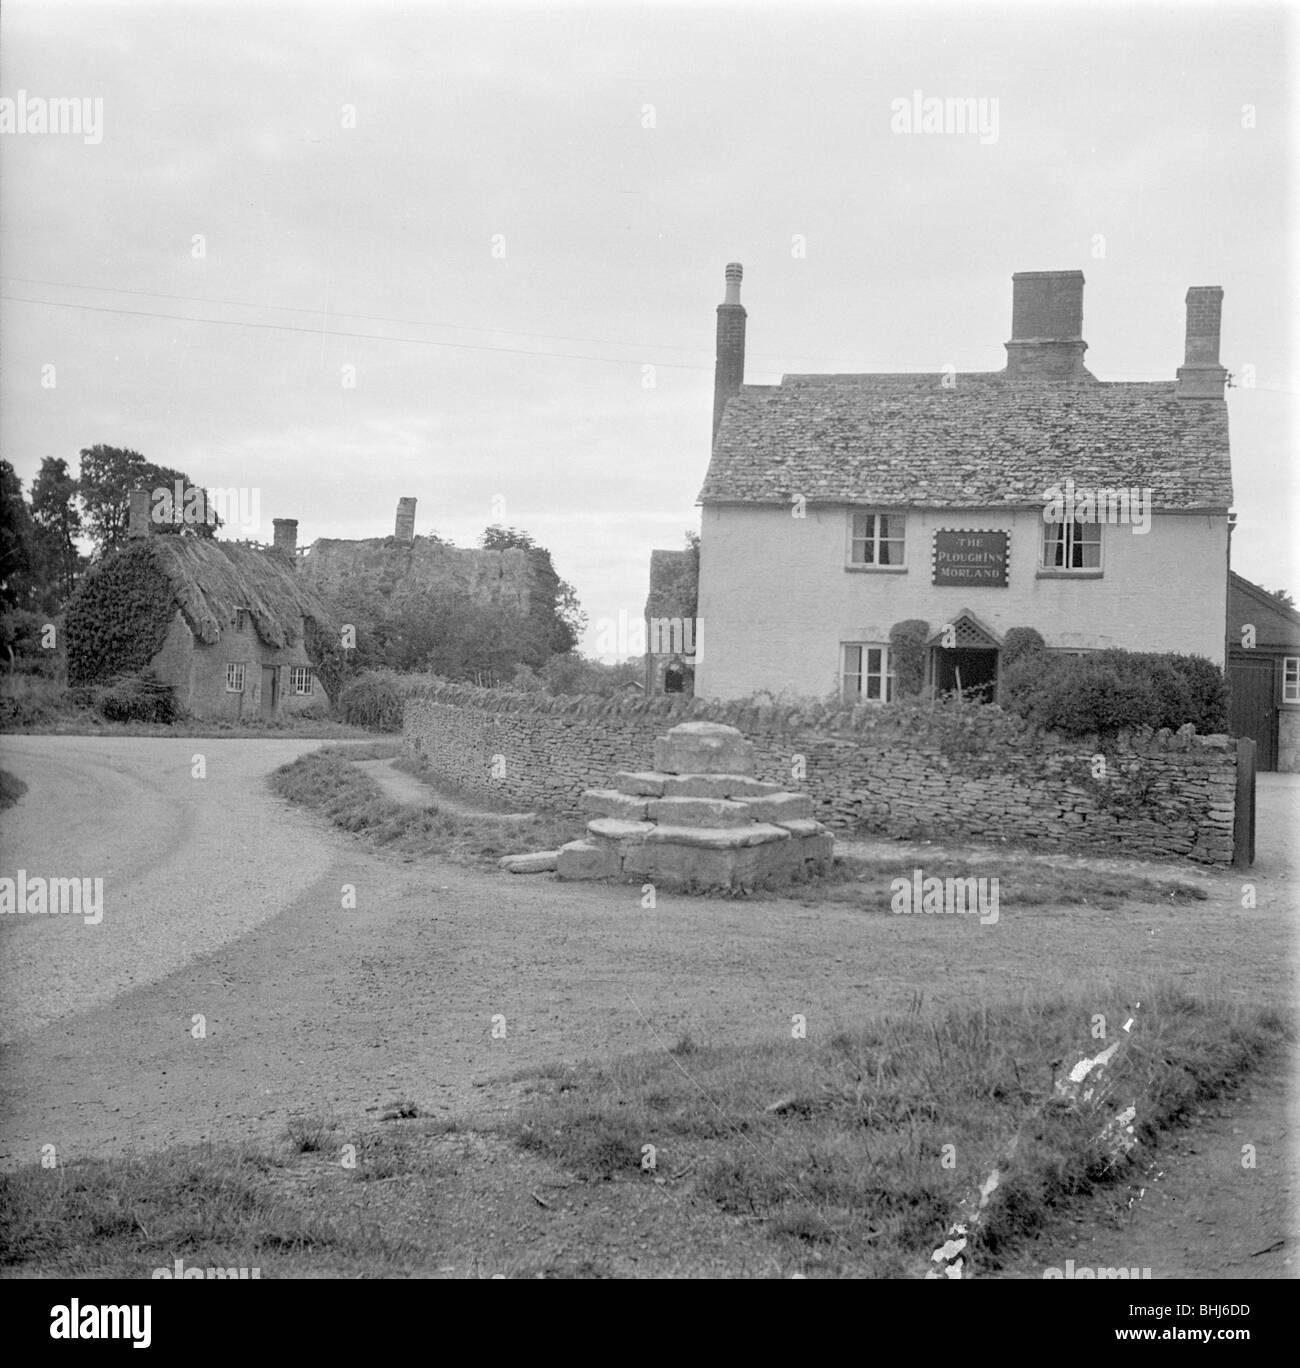 The Plough Inn, Kelmscott, Oxfordshire. Artist: Miss Wight - Stock Image